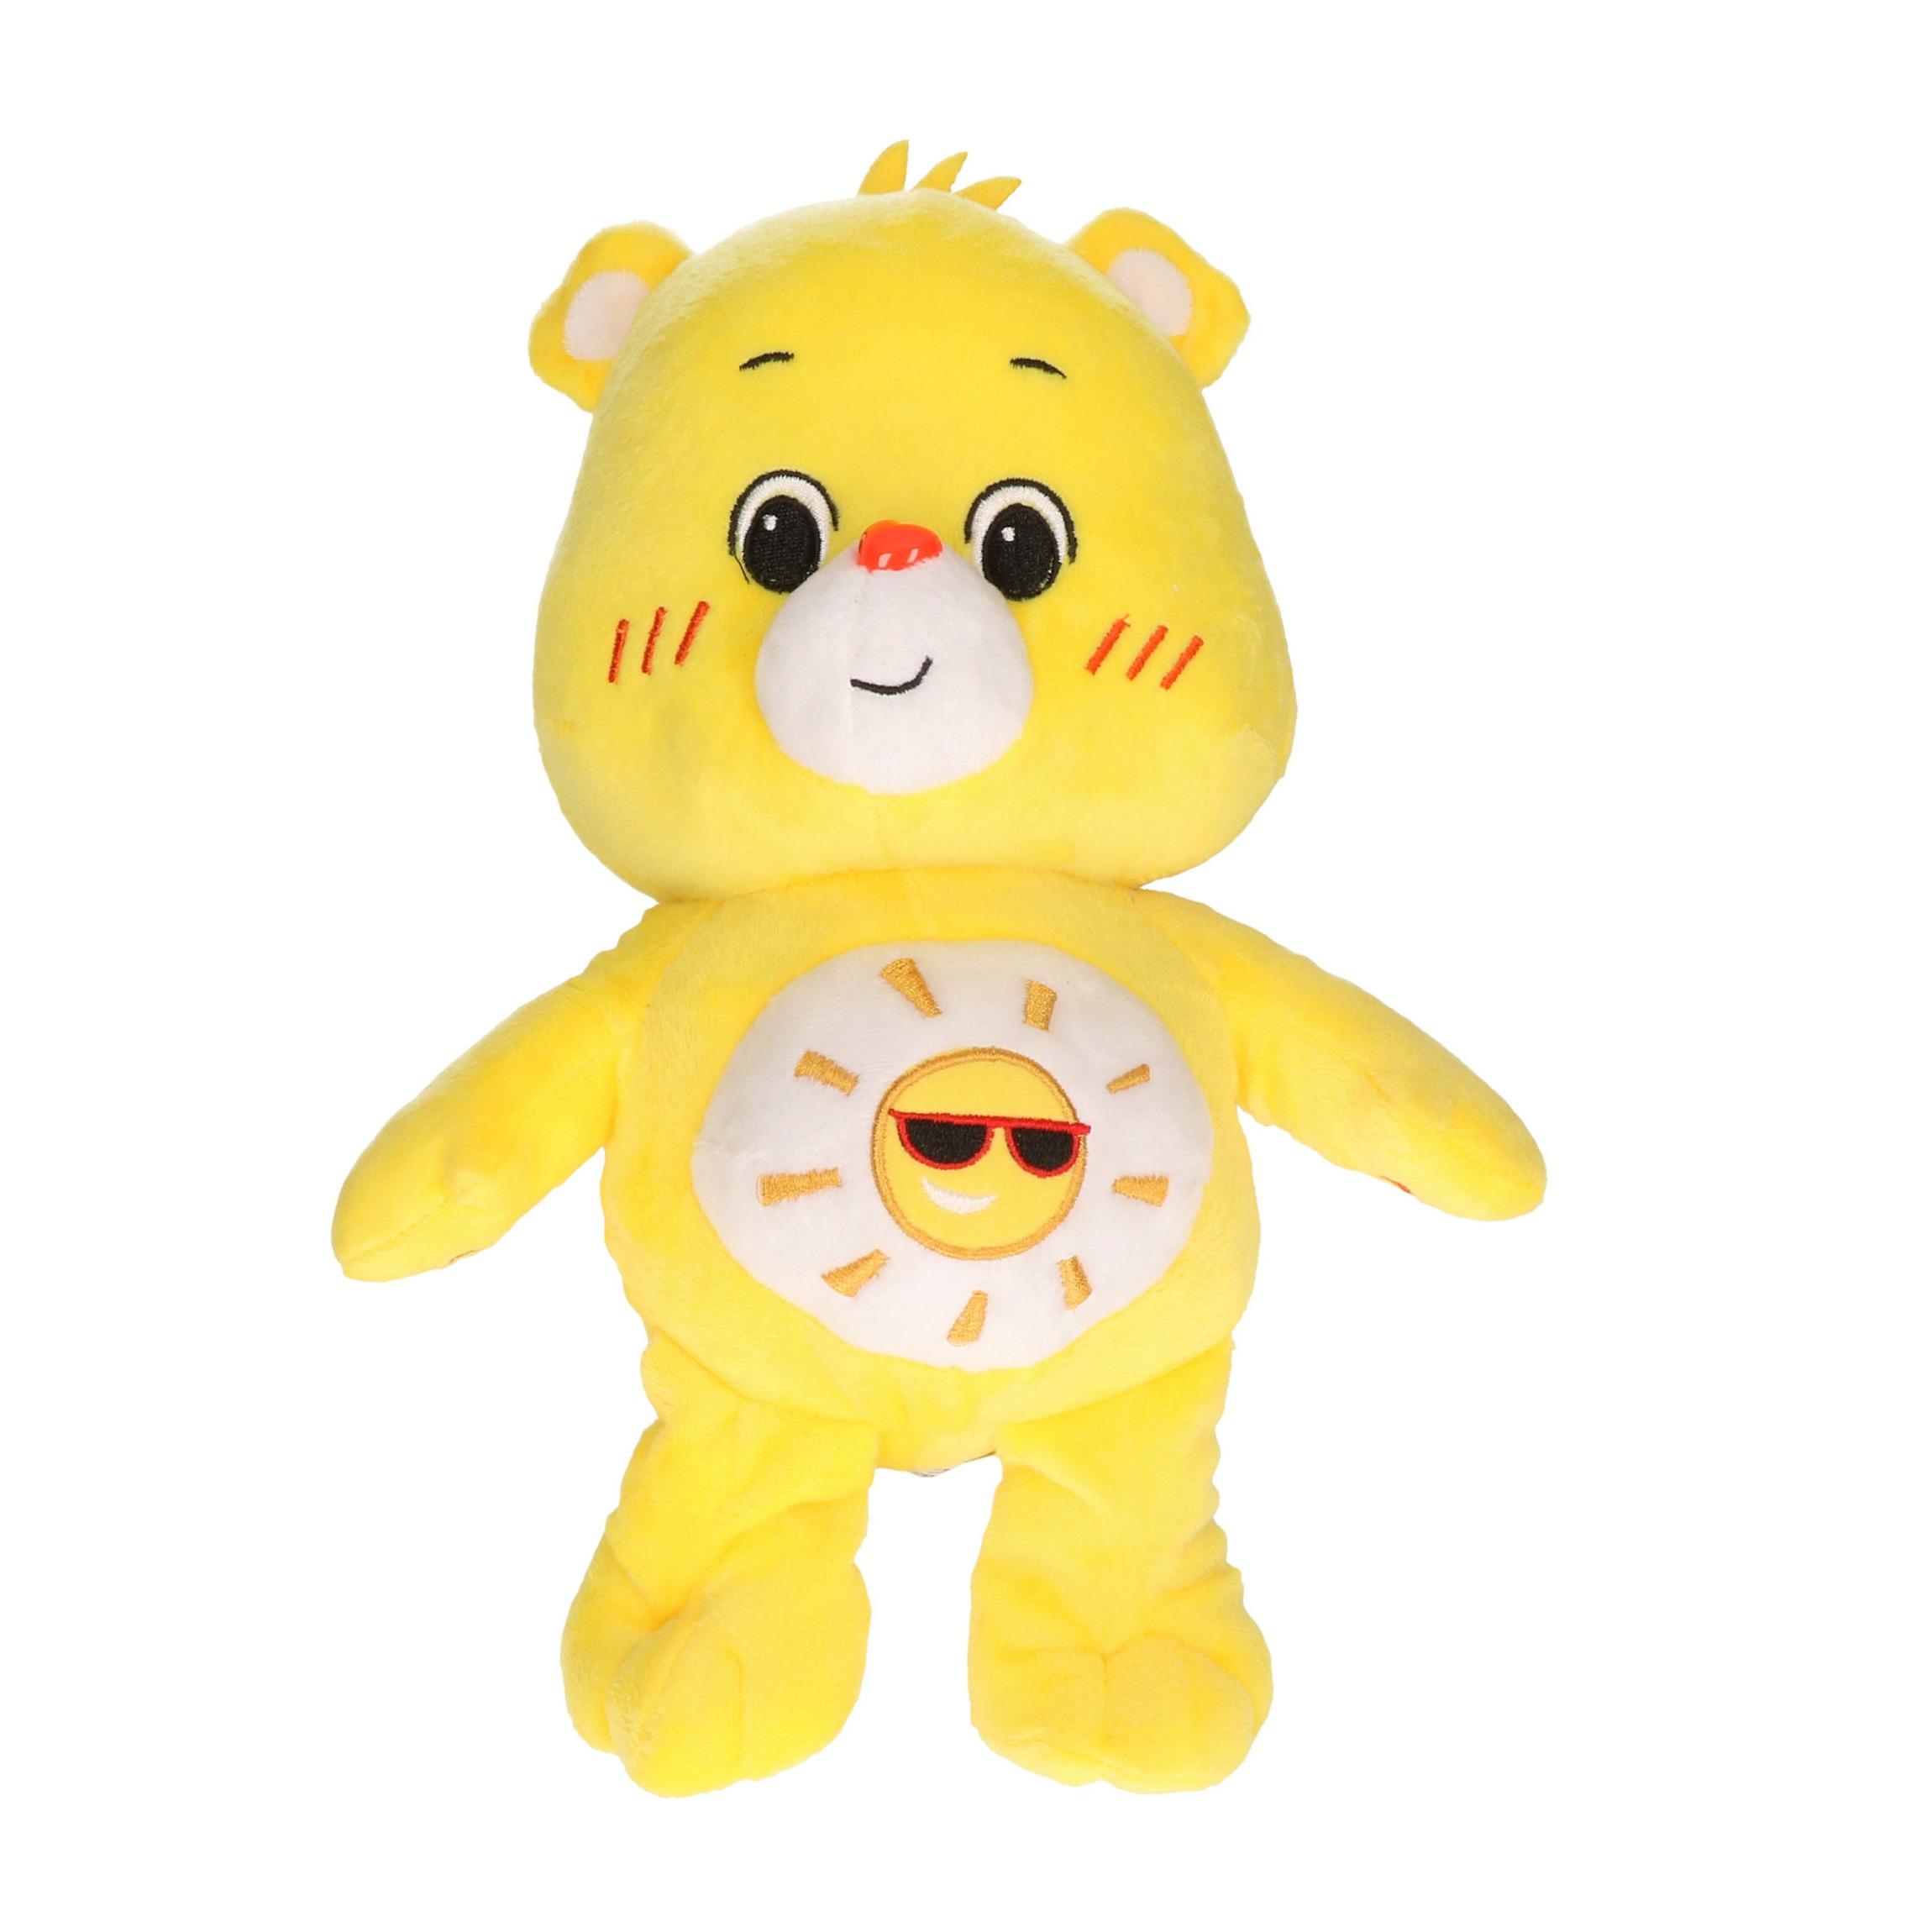 Pluche Troetelbeertje knuffel geel 21 cm